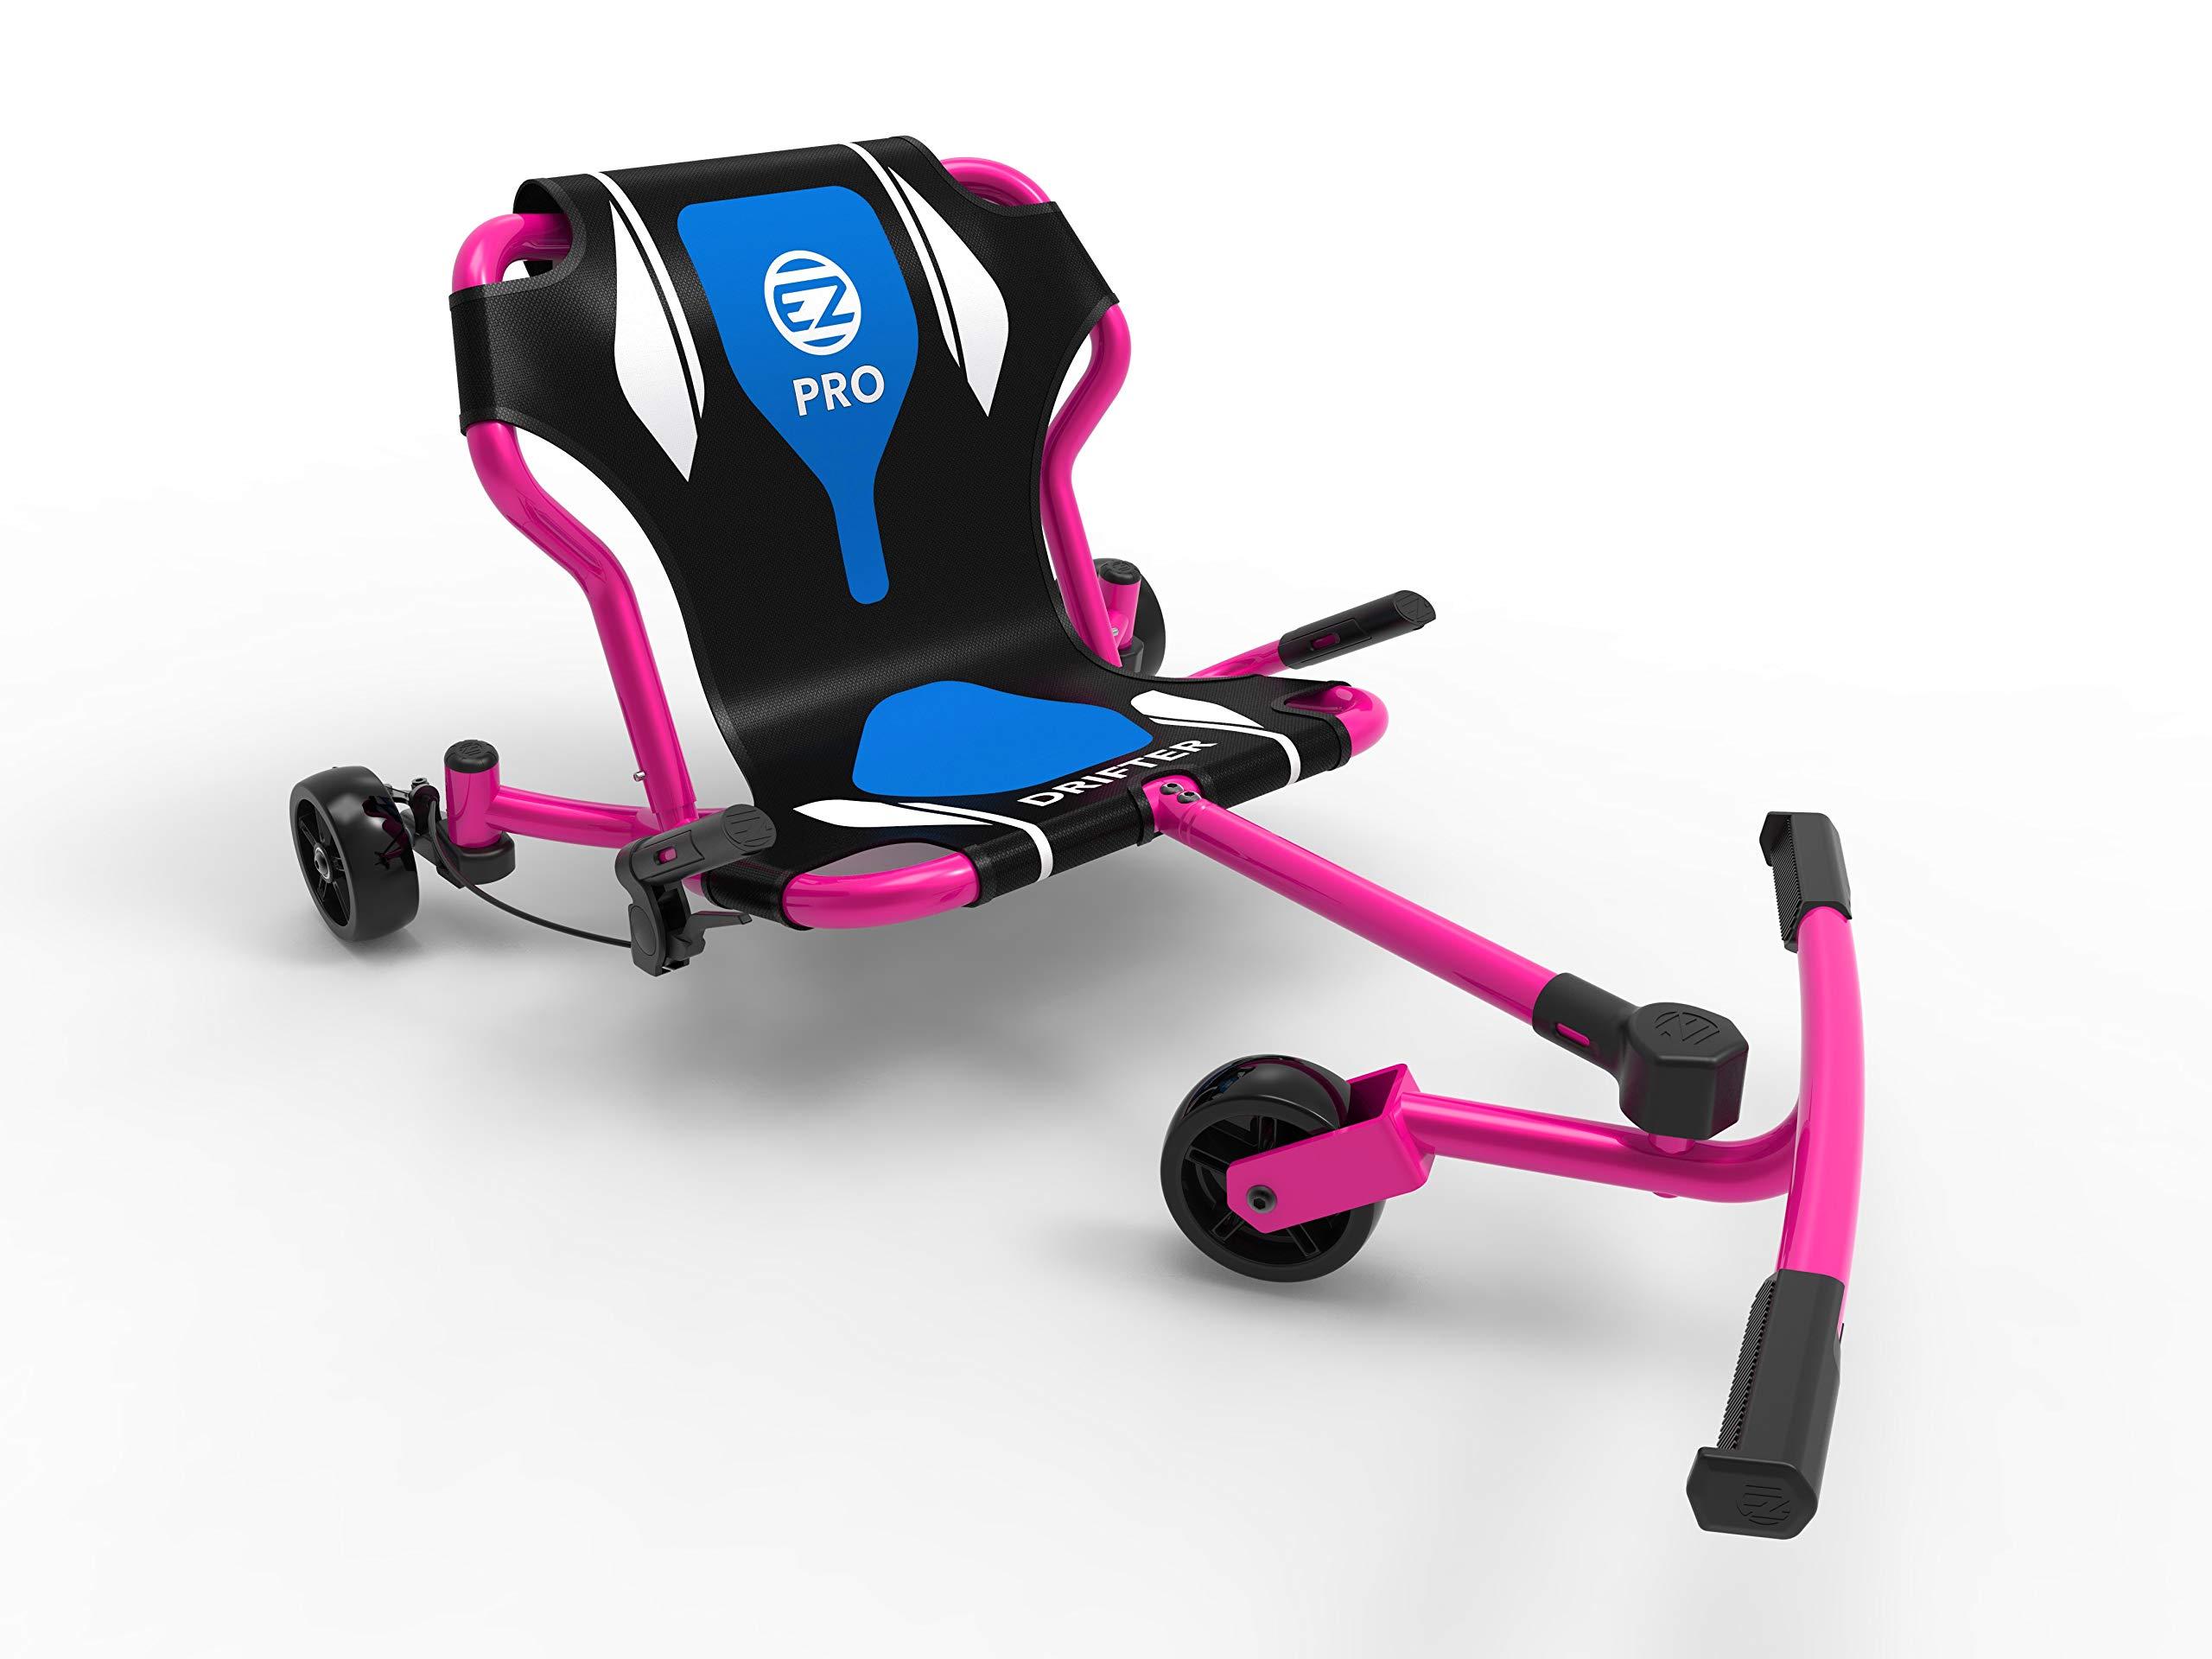 Pink EzyRoller New Drifter-X Ride on Toy